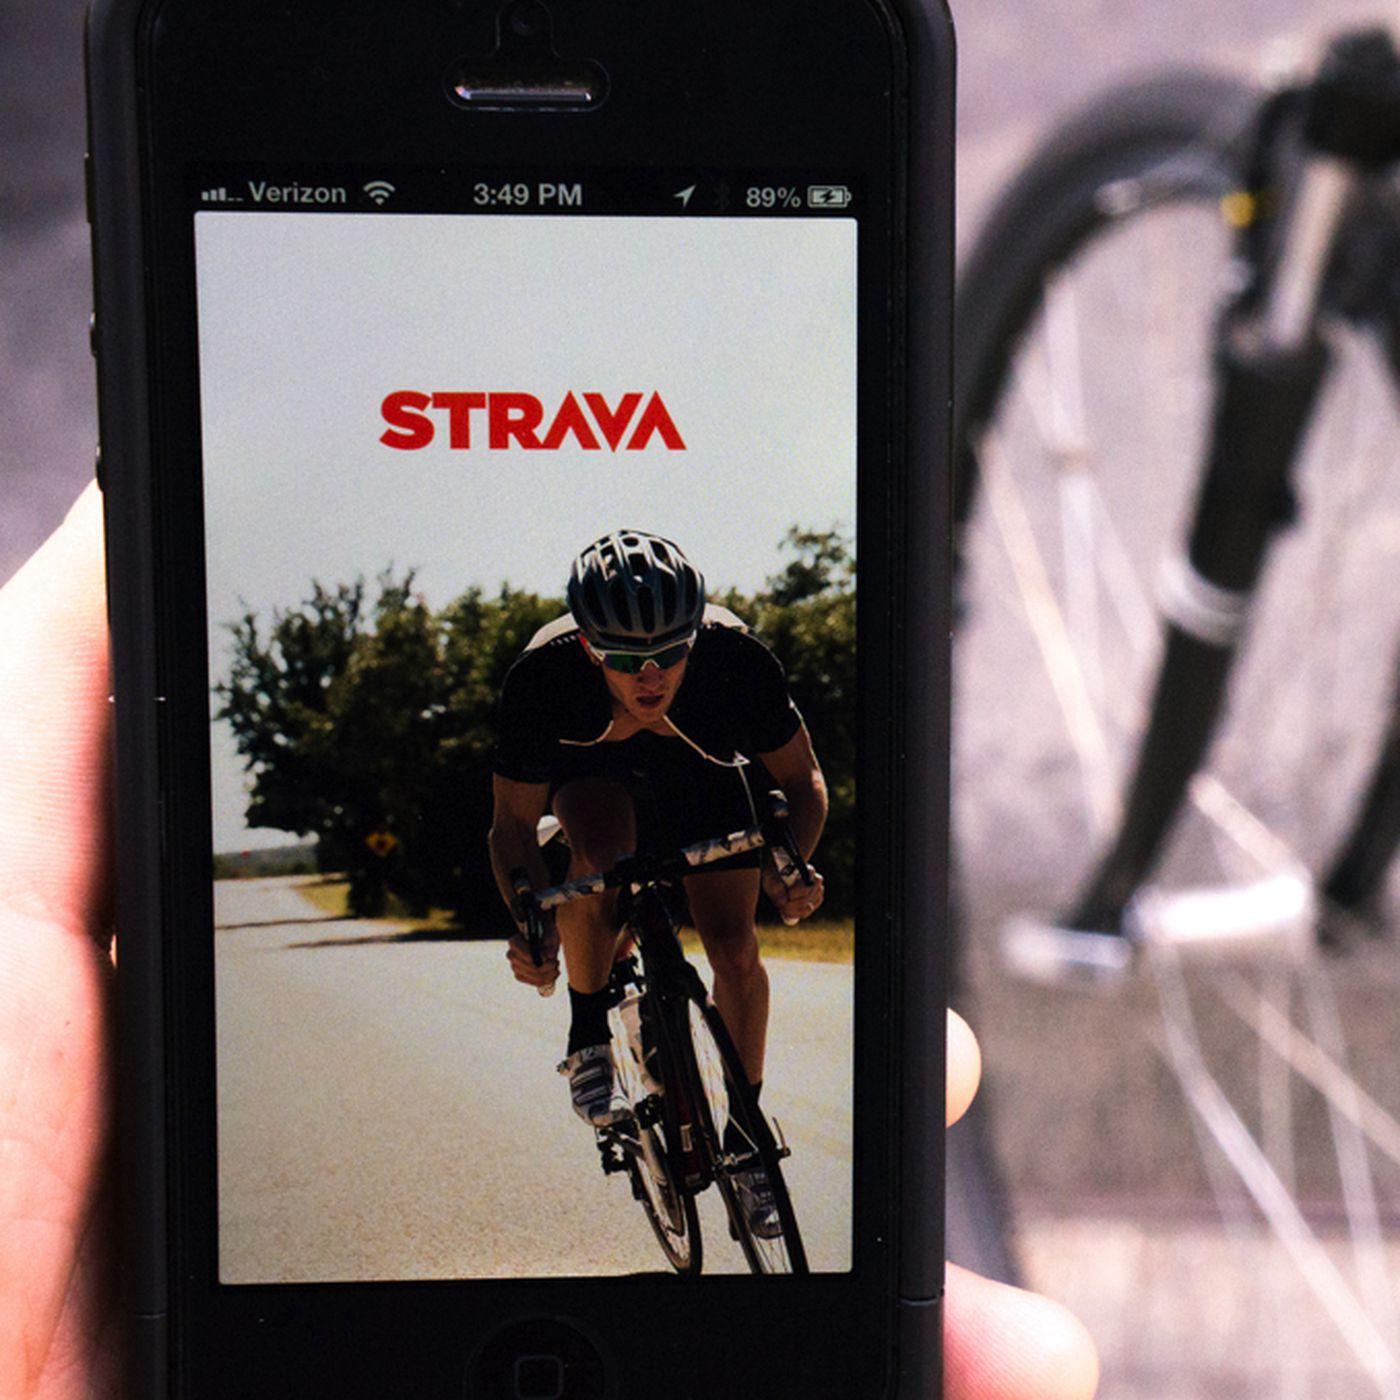 Strava's Premium service will pay for smartphones that break